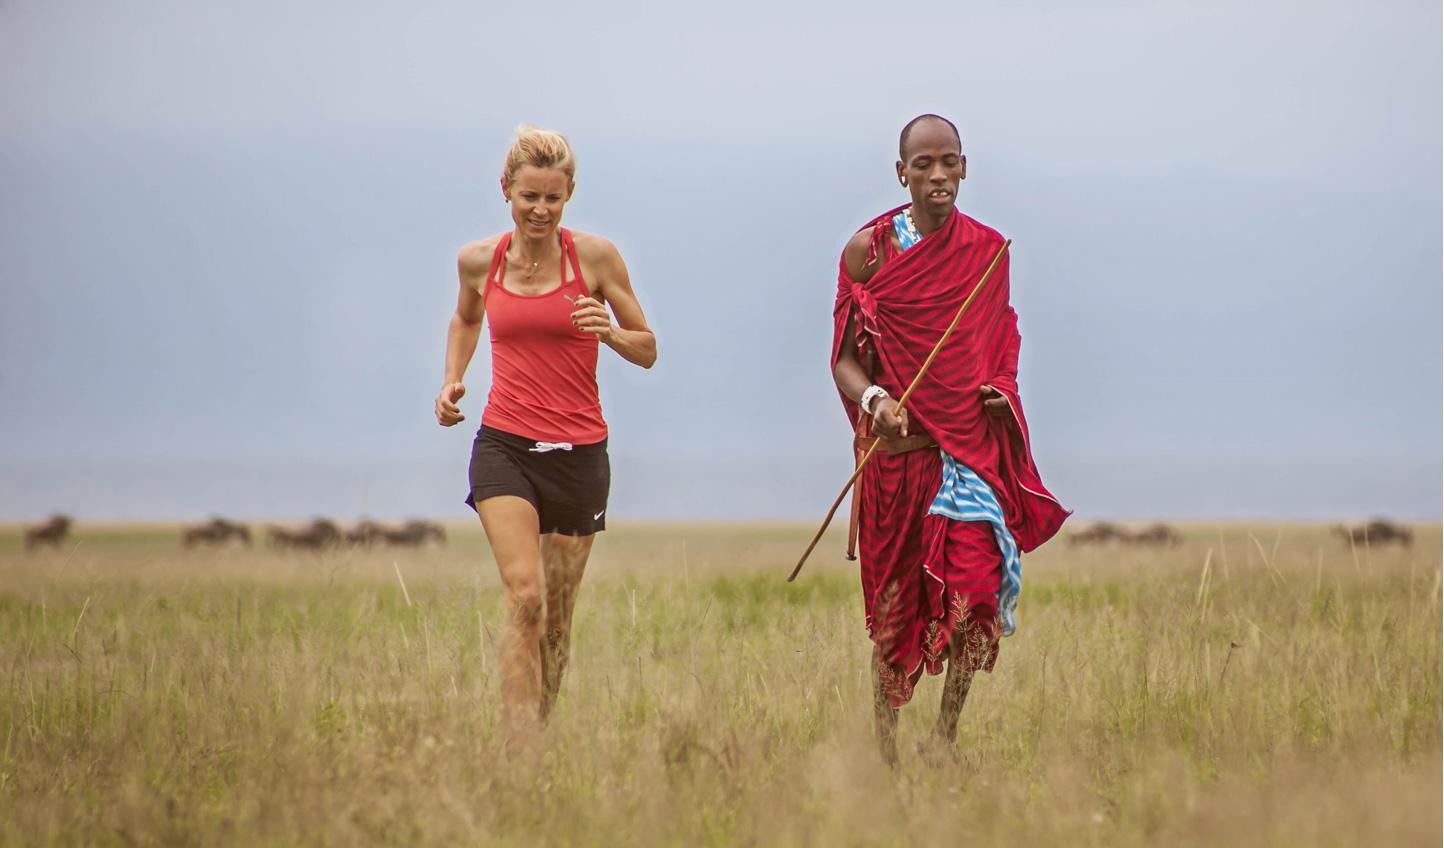 Run with the Maasai warriors